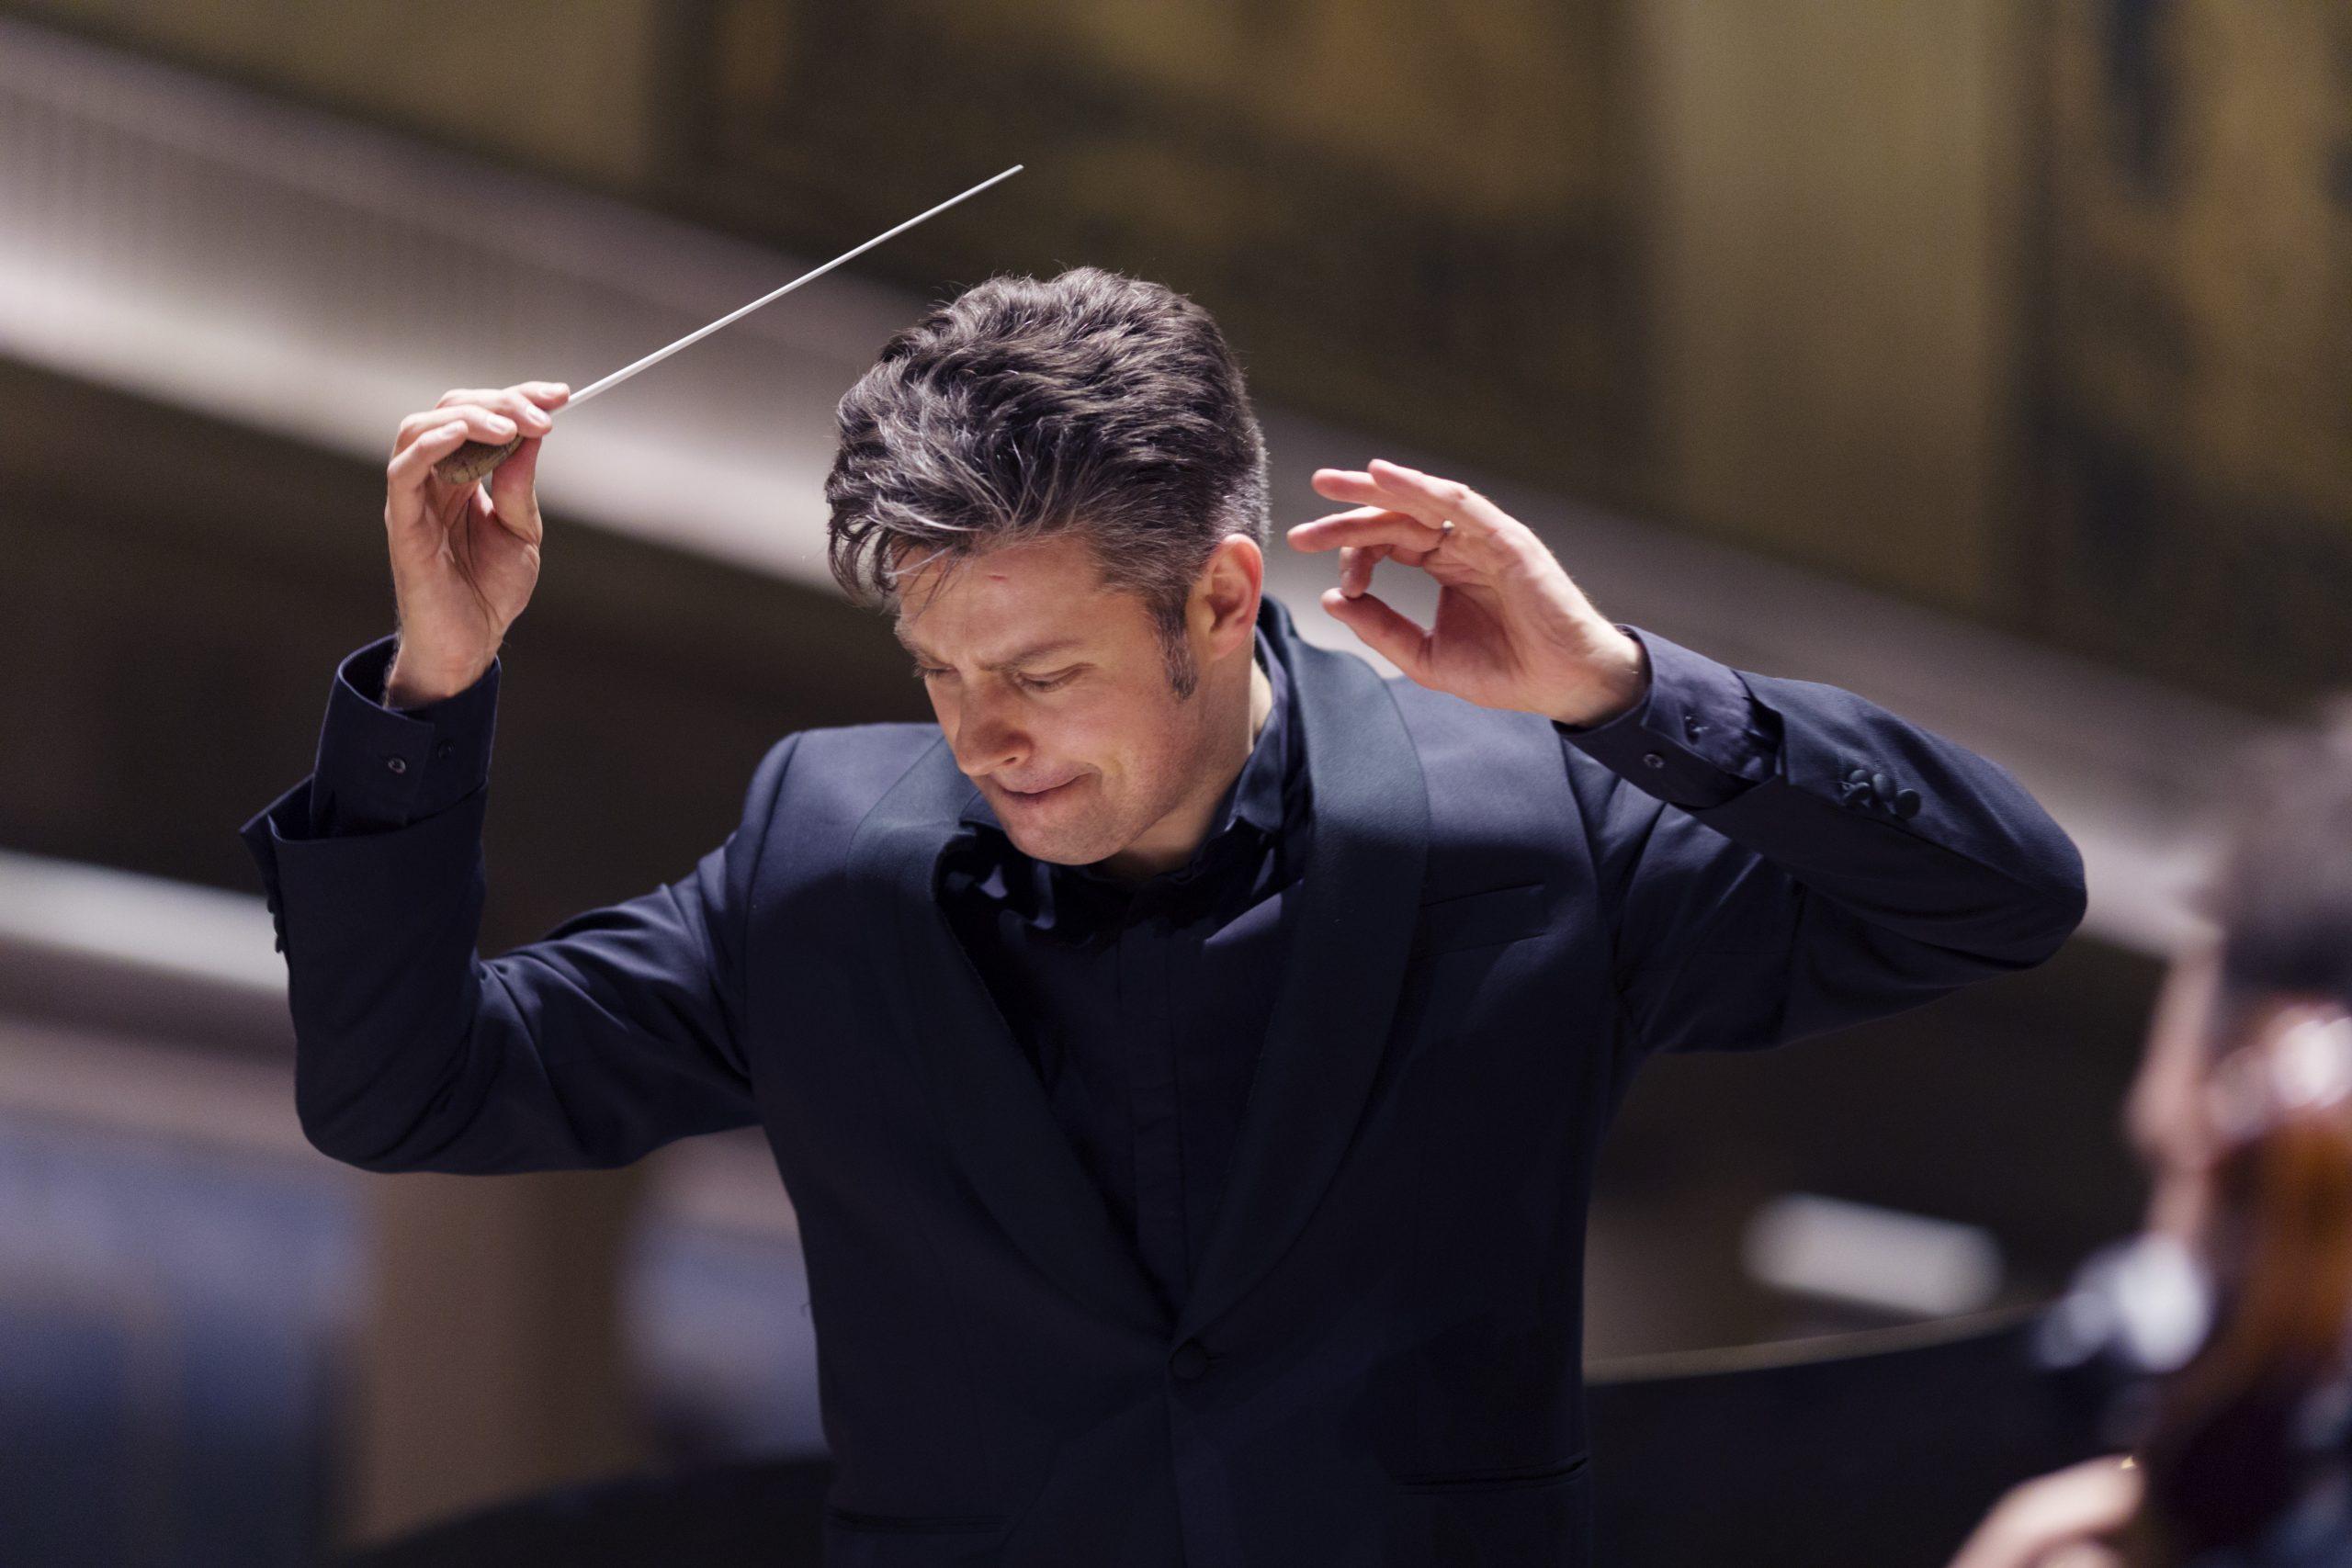 Joseph Bastian & Musikalische Akademie Mannheim 3